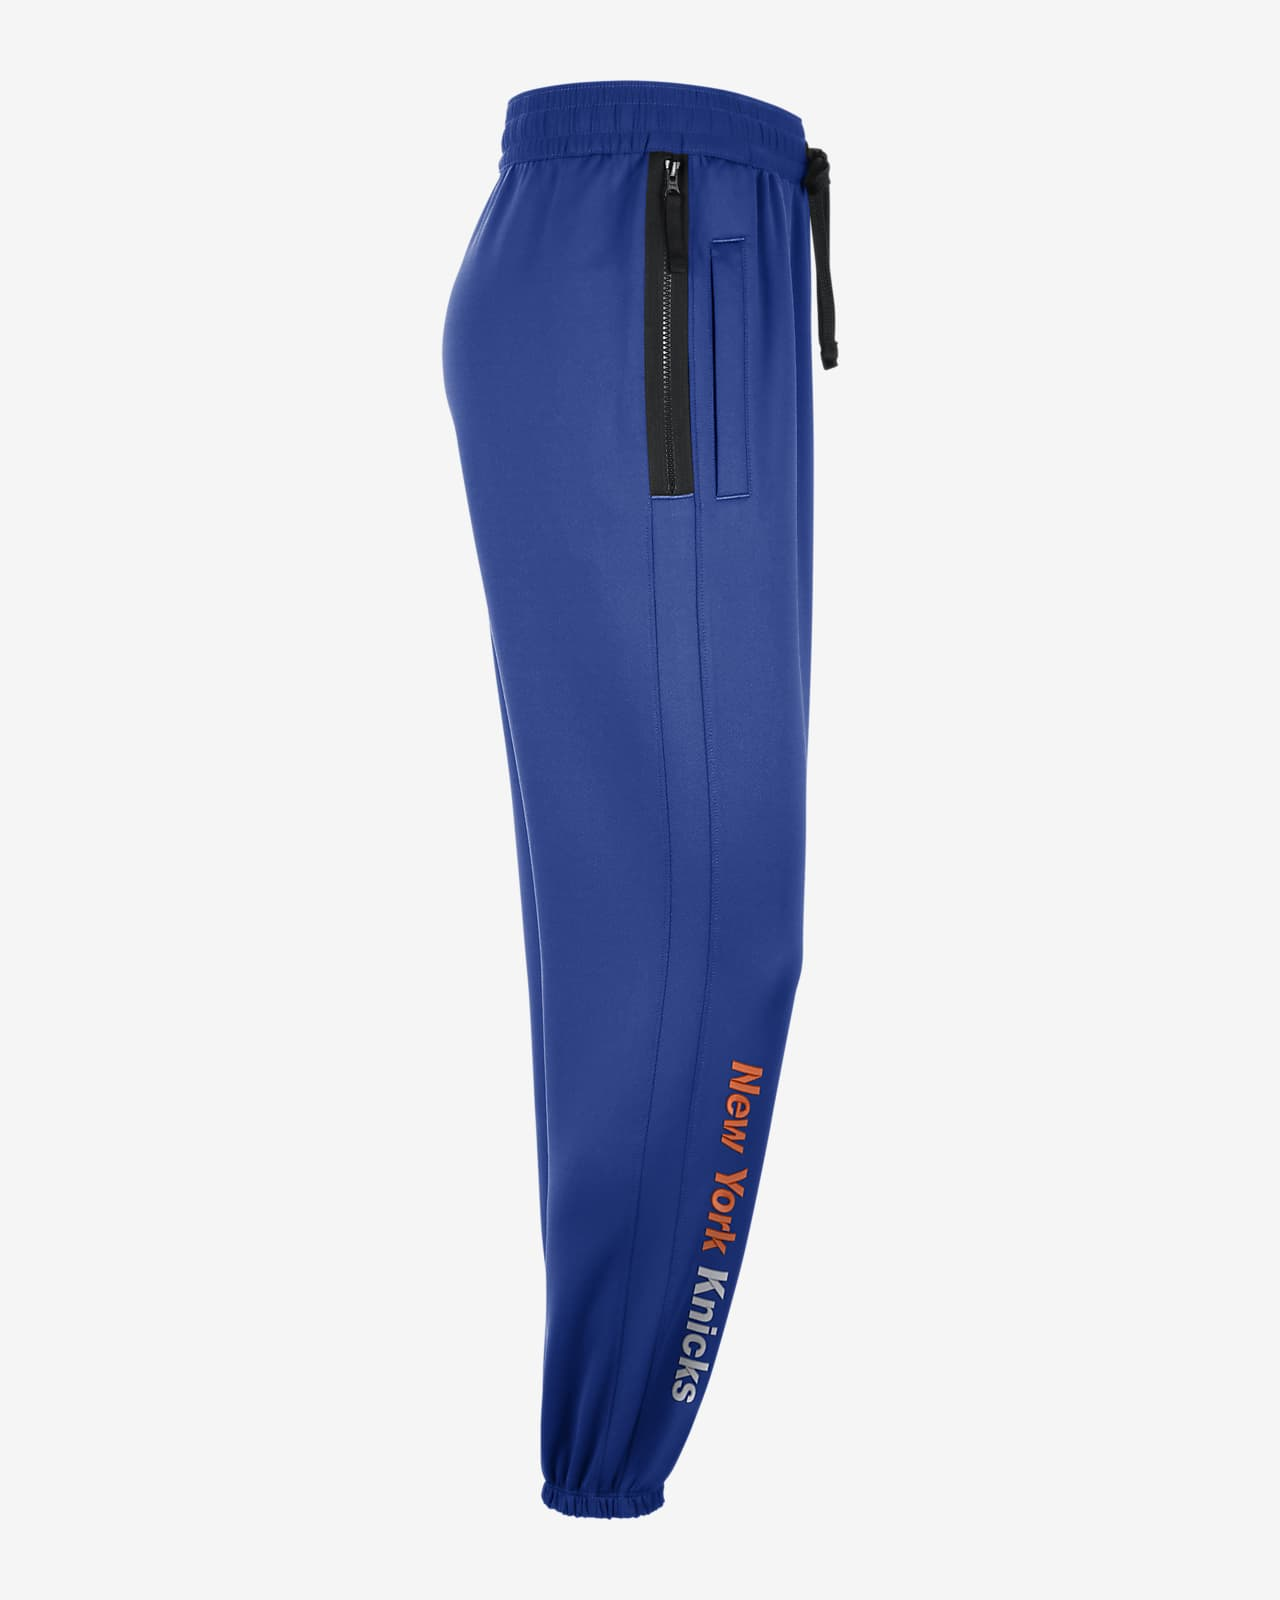 Pantalones De La Nba De Nike Therma Flex Para Hombre New York Knicks Showtime Nike Cl